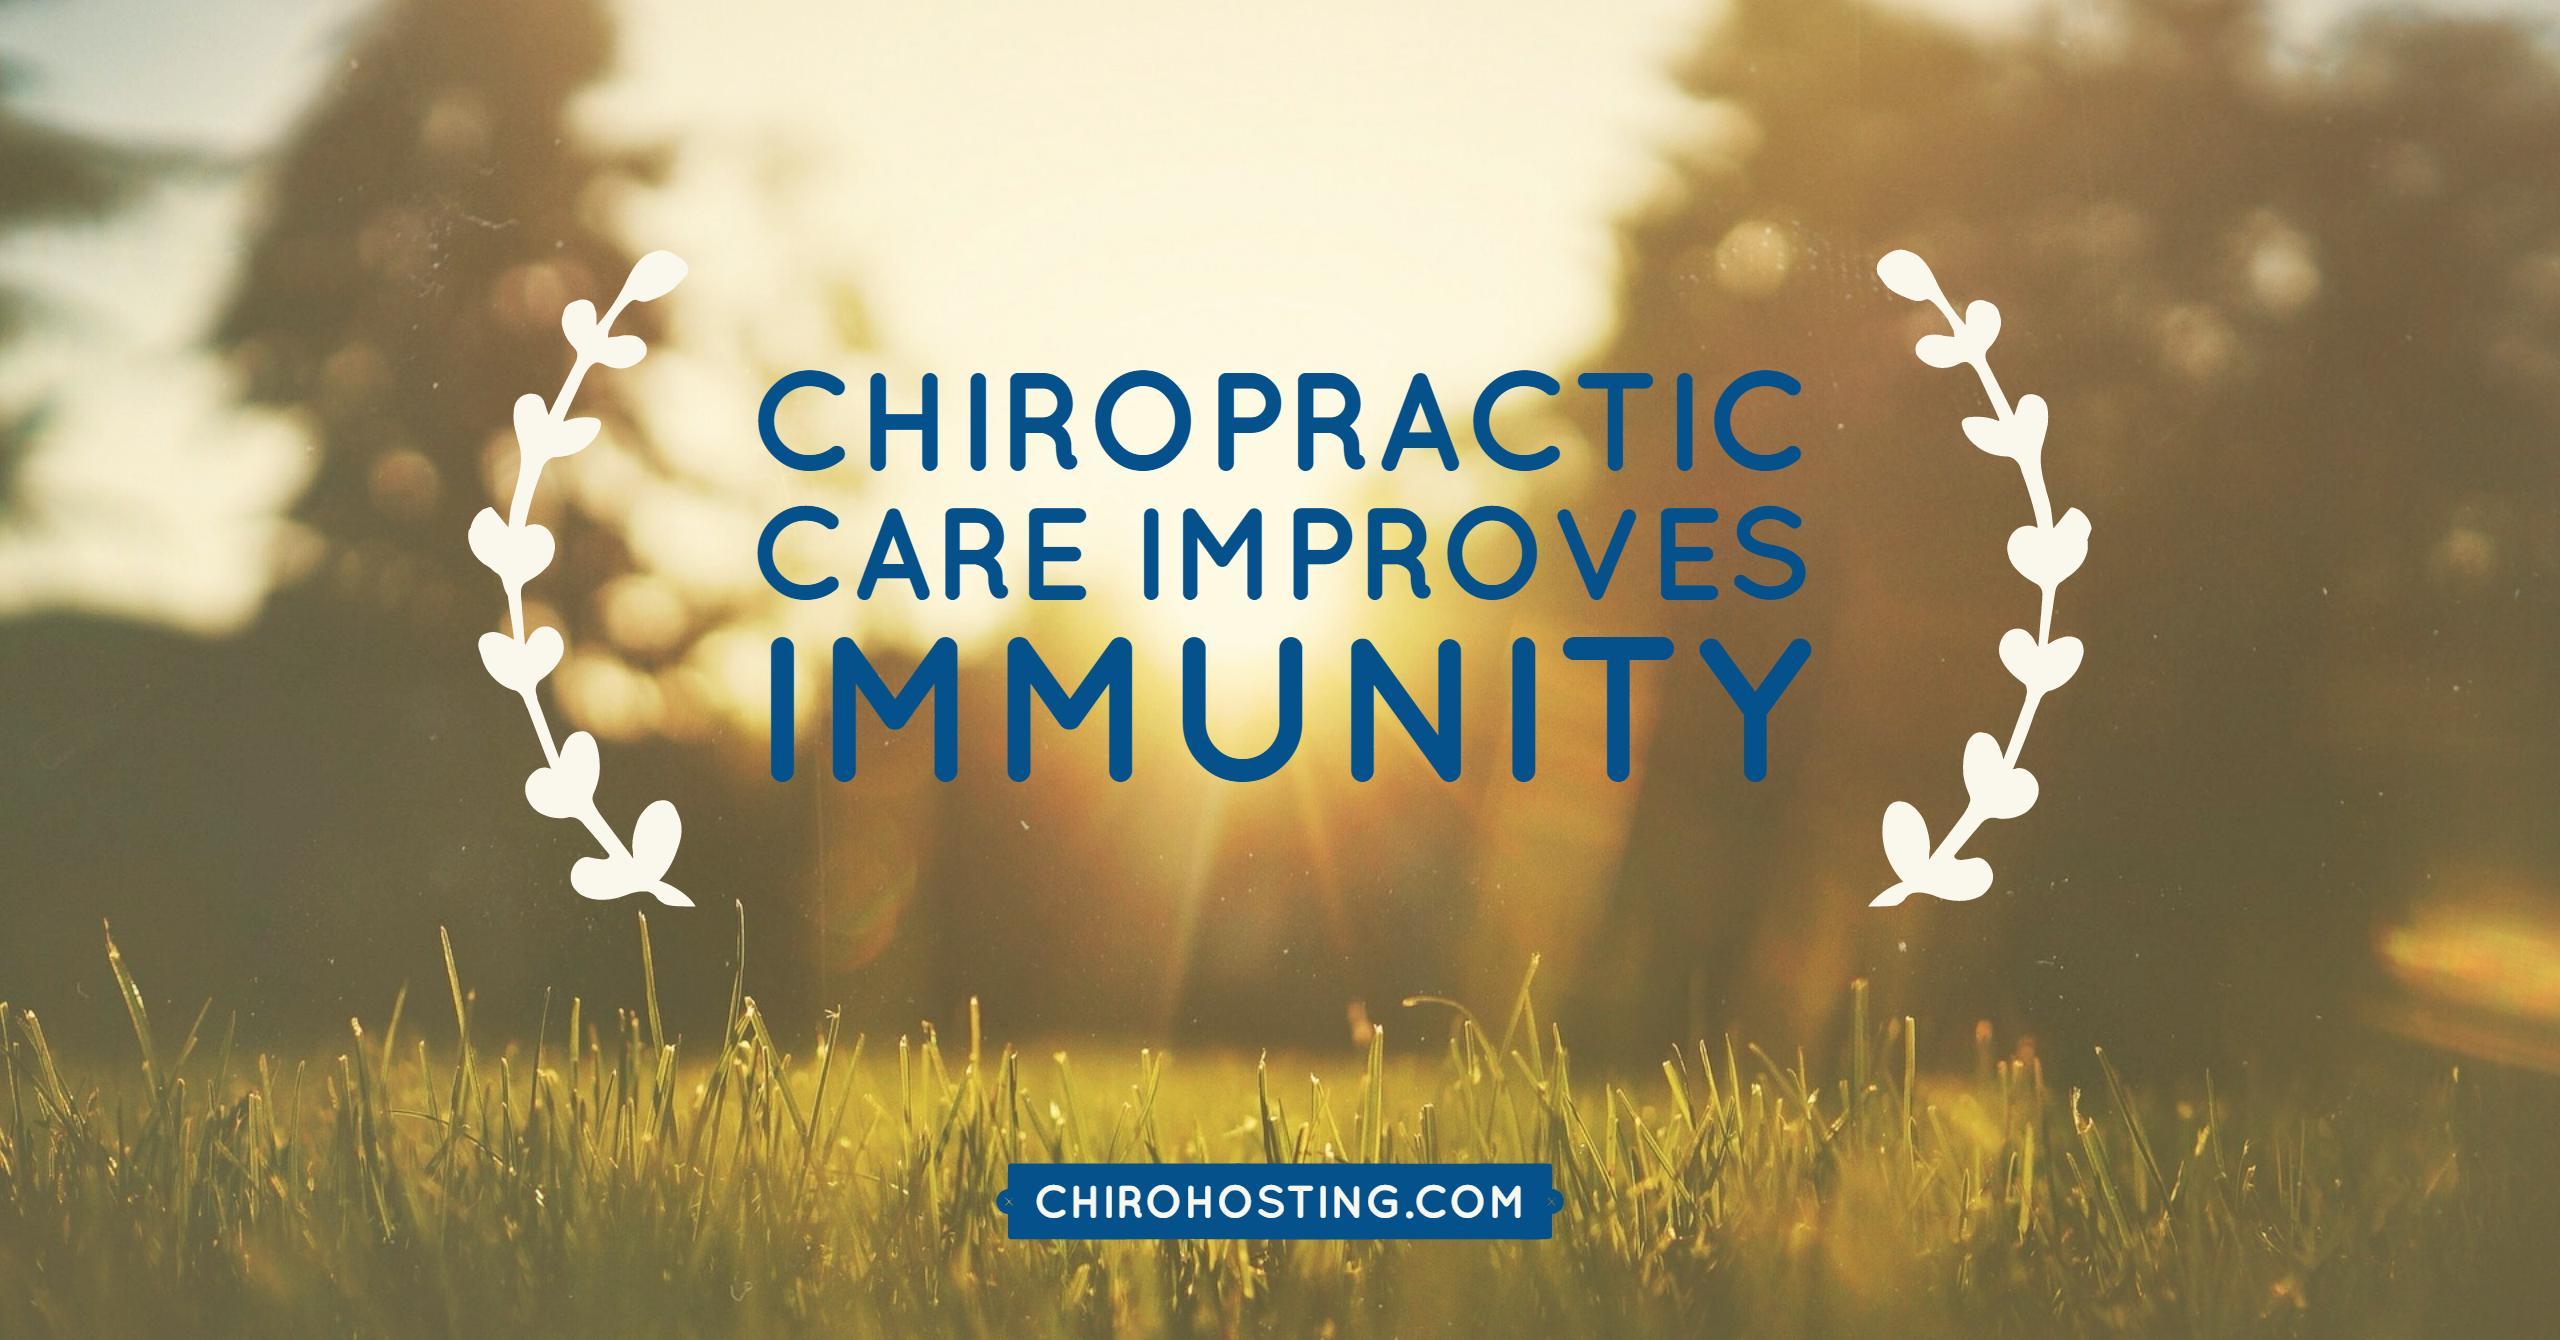 Chiropractic Care Improves Immunity